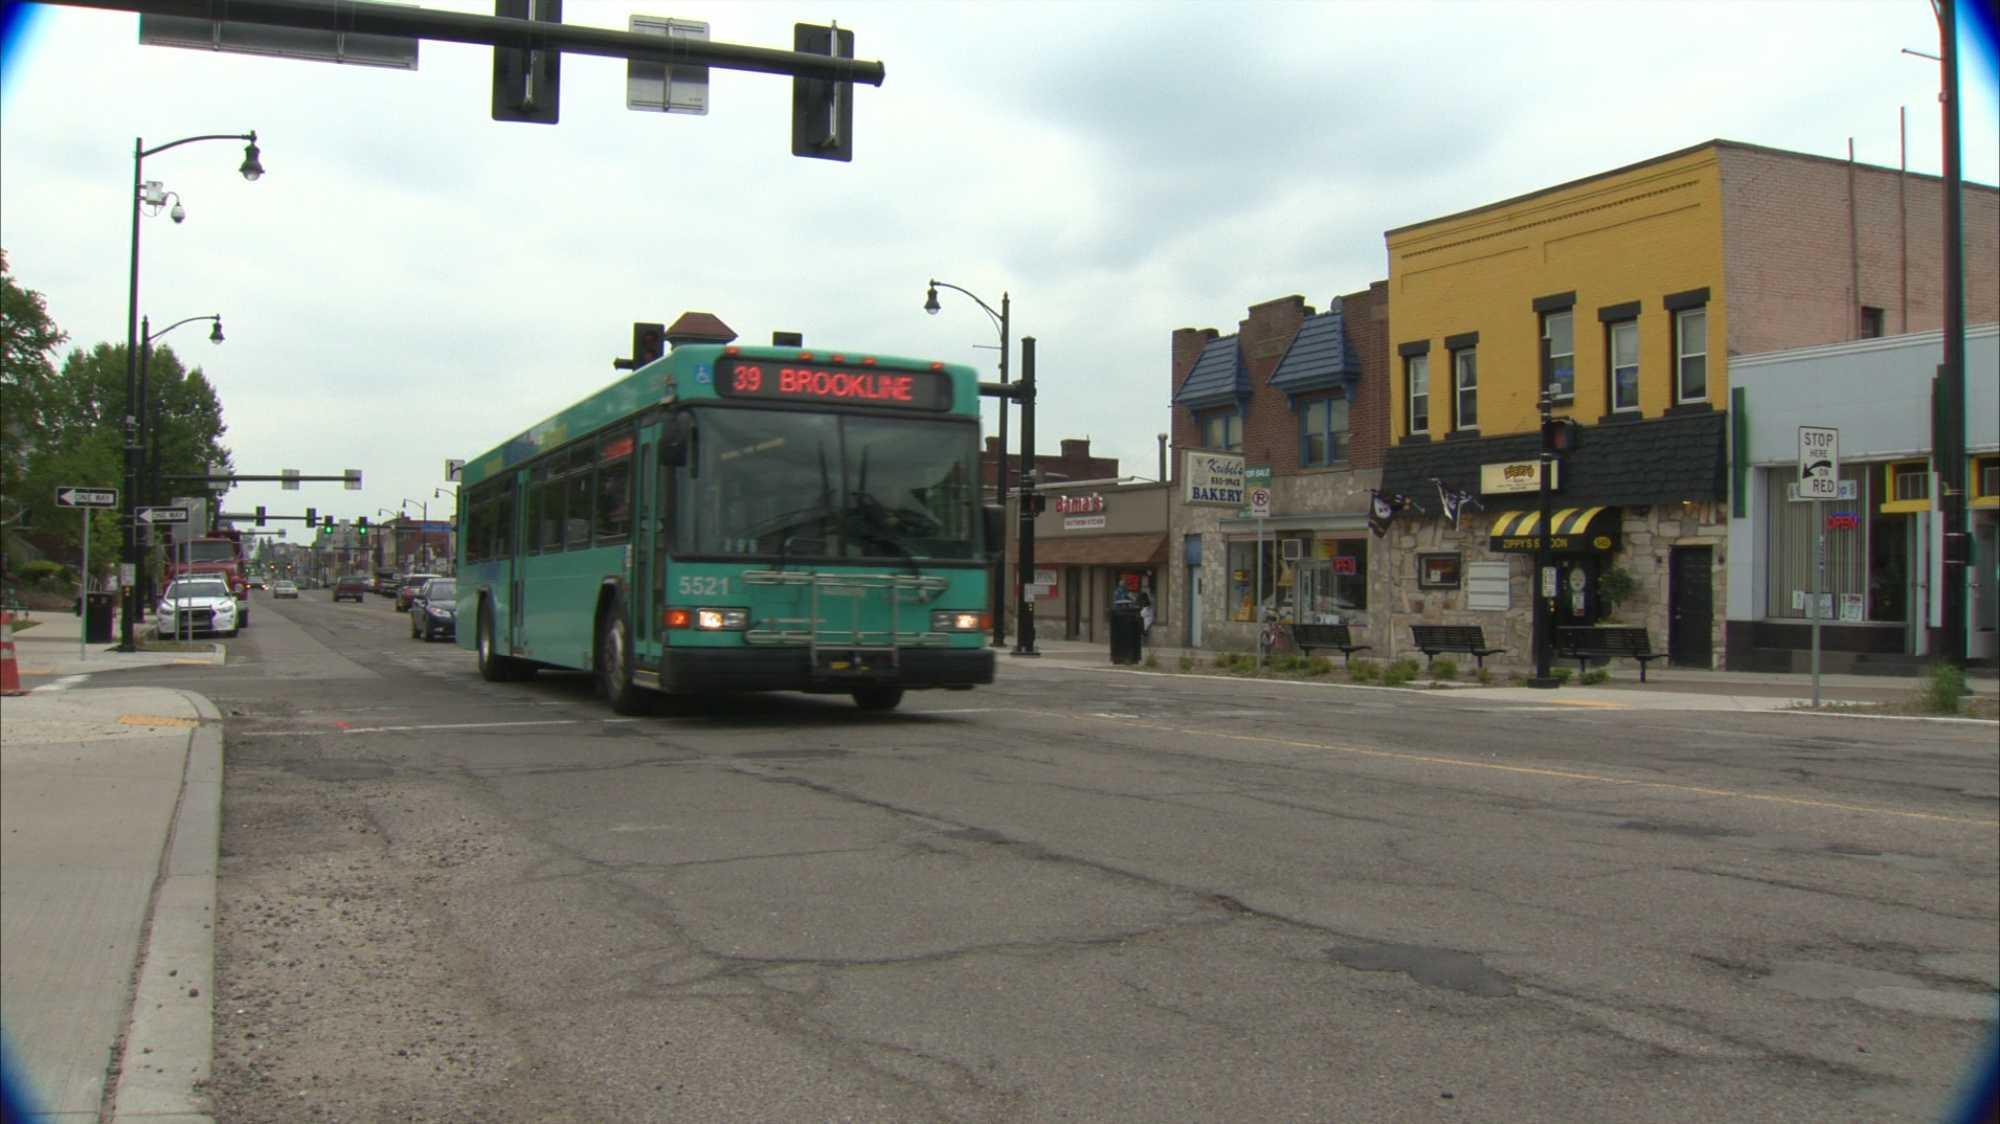 The 39 Brookline bus route serves Brookline Boulevard.